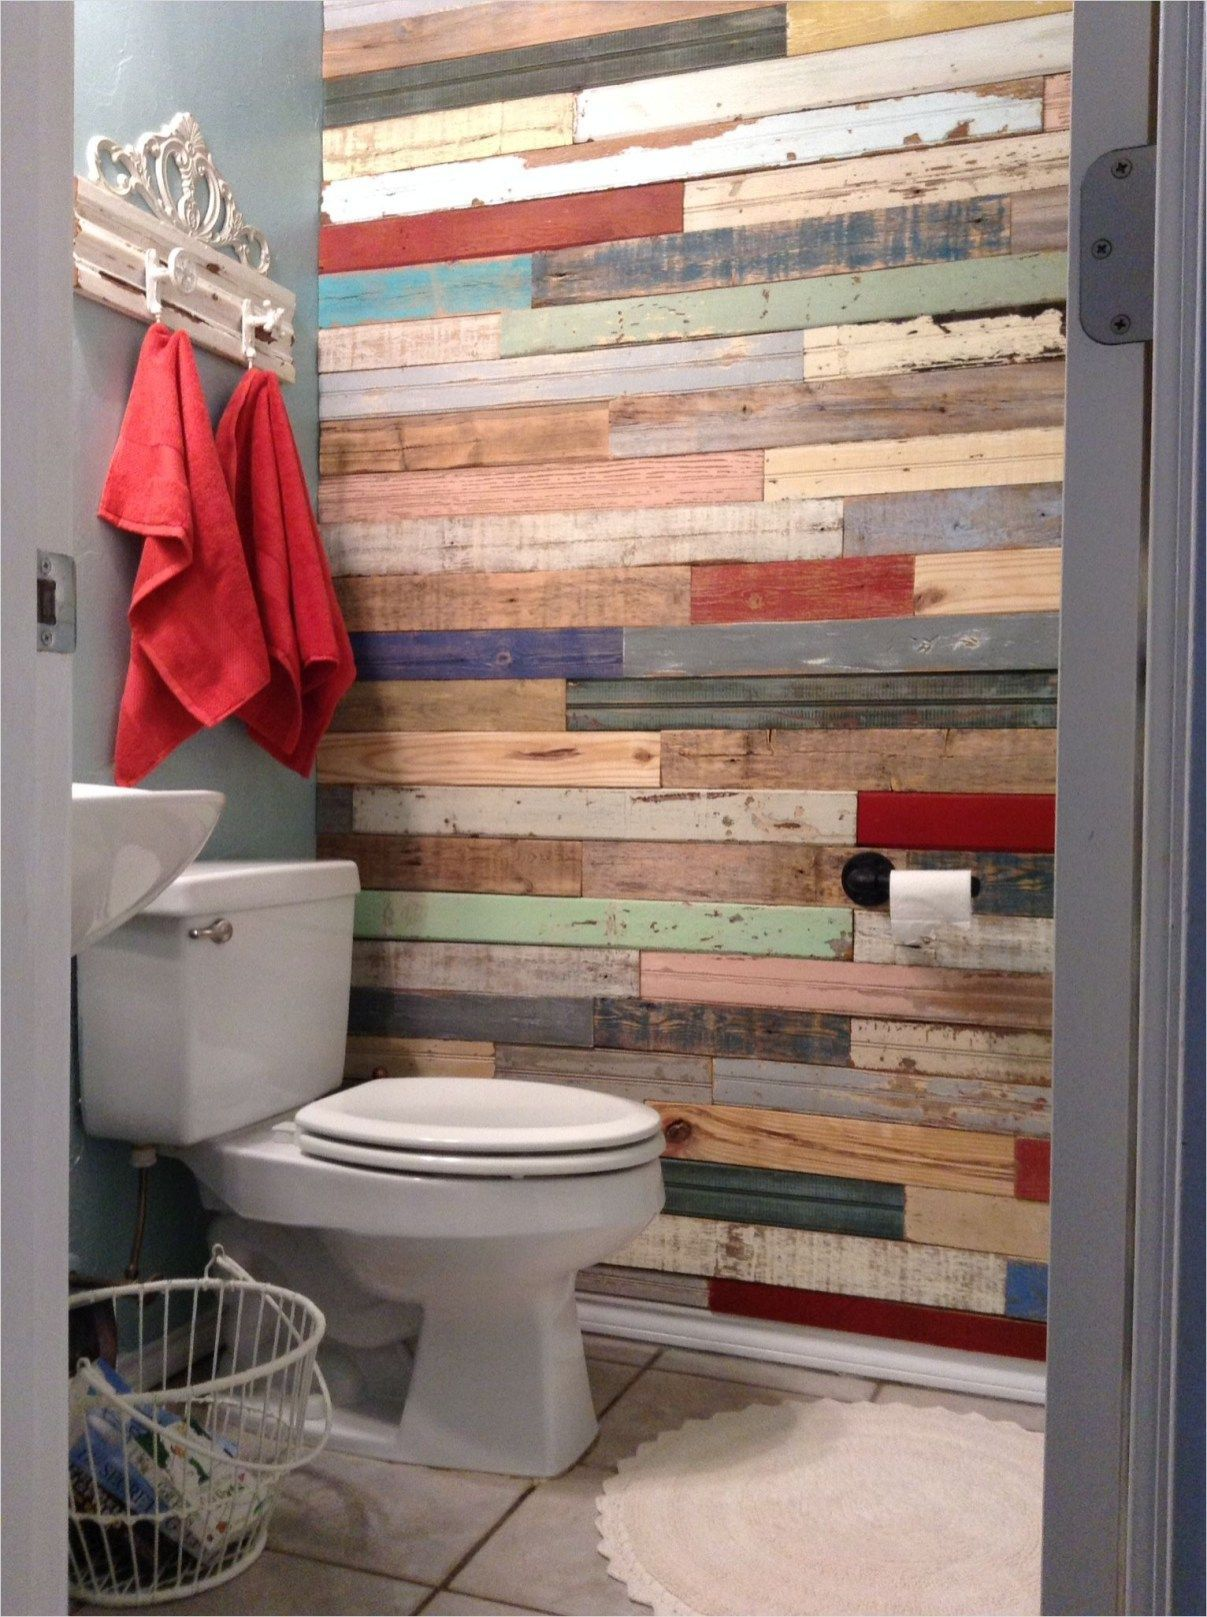 Creative 41 Diy Pallet Bathroom Walls Ideas 62 Diy Bathroom Renovation Wood Wall Salvaged Fence And 6 Pallet Wall Bathroom Pallet Bathroom Diy Pallet Wall